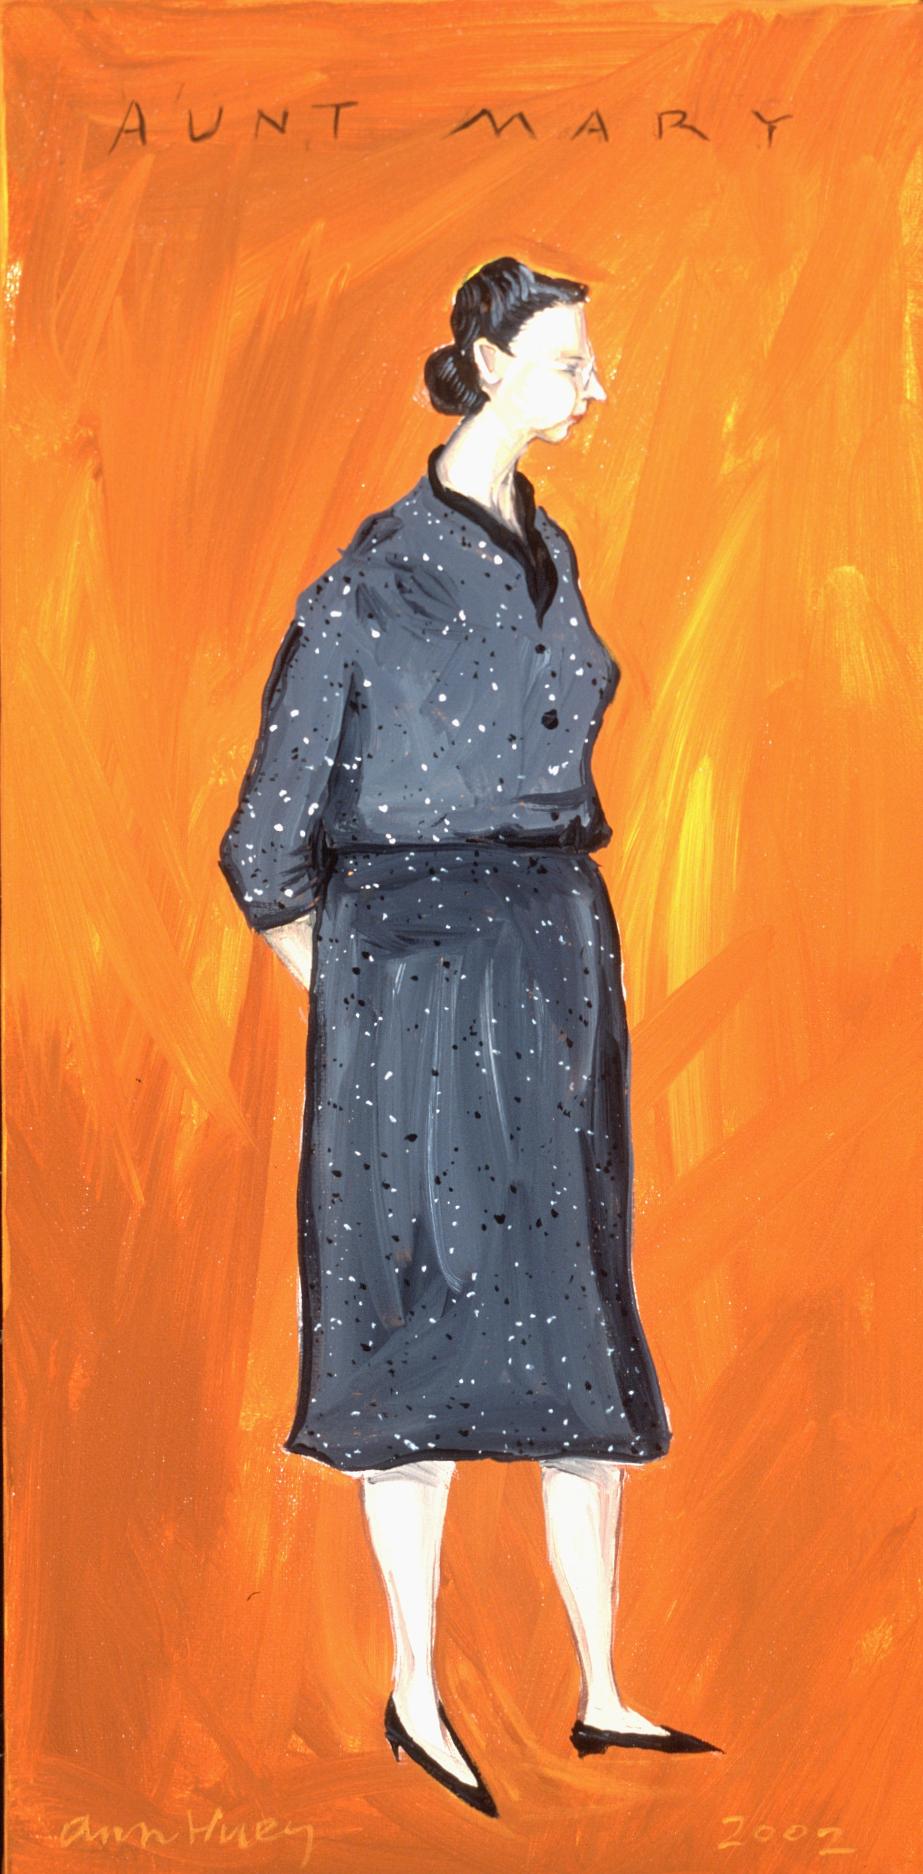 Aunt Mary - 1967